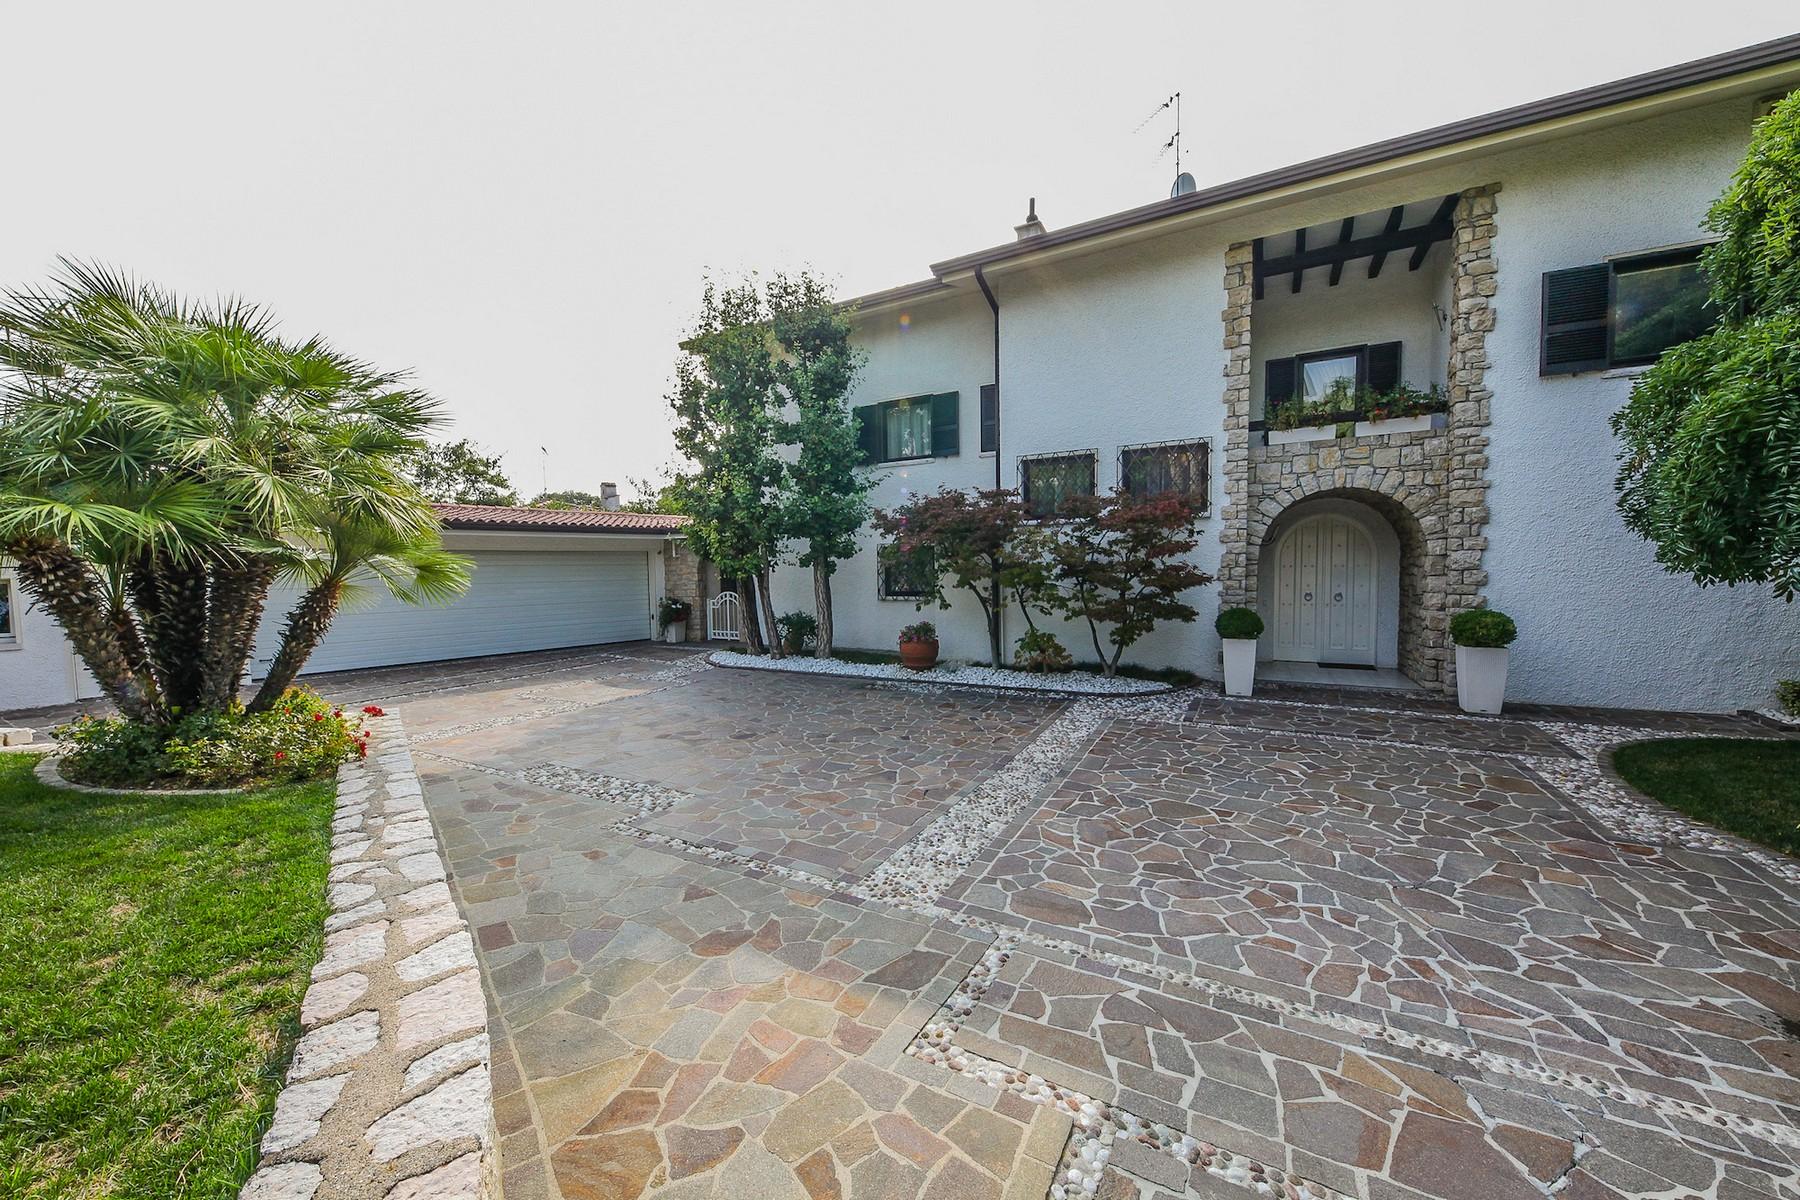 Villa in Vendita a Padenghe Sul Garda: 5 locali, 330 mq - Foto 12